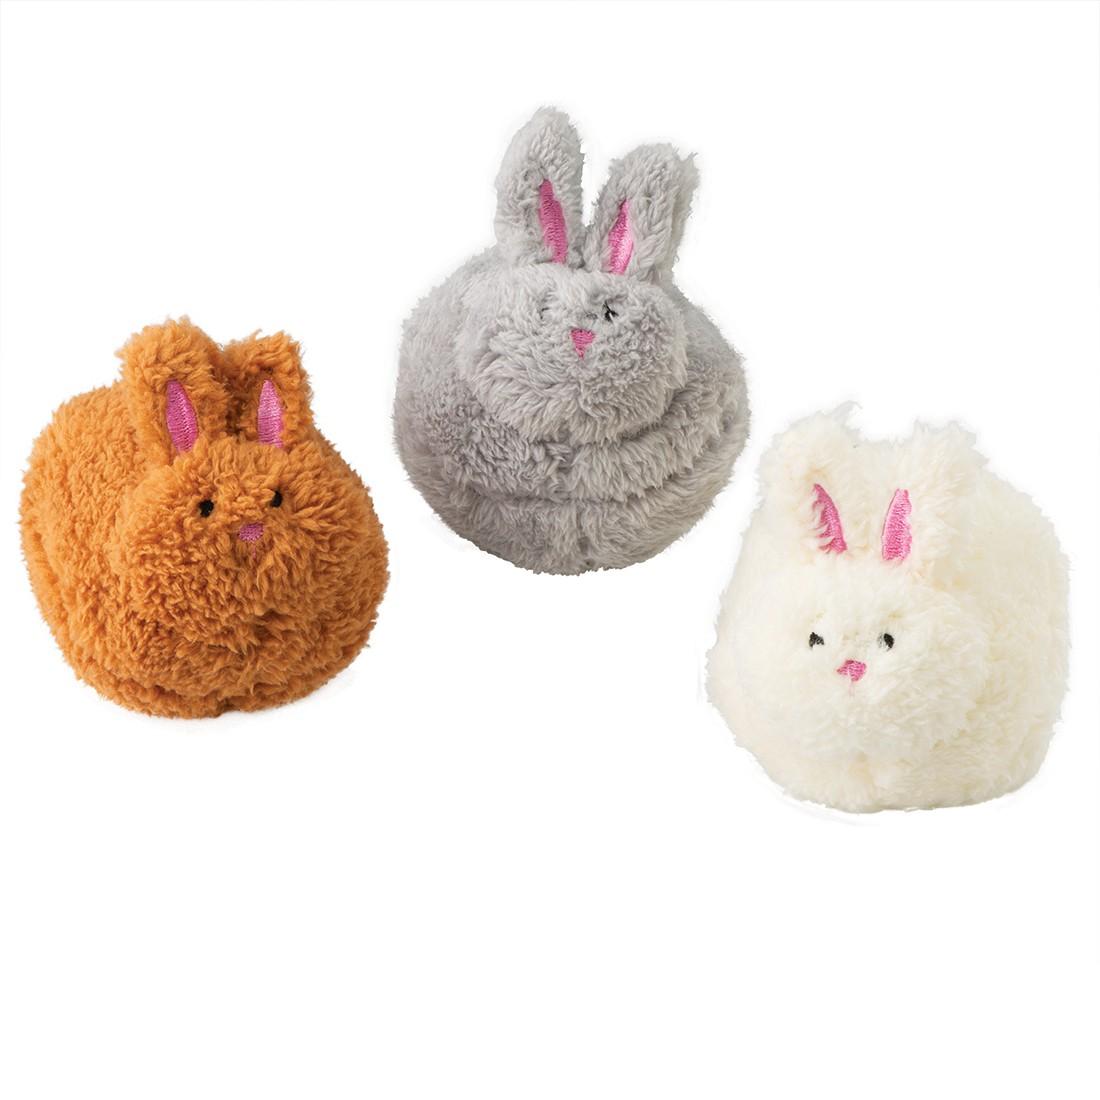 Plush Pom Pom Bunnies [image]